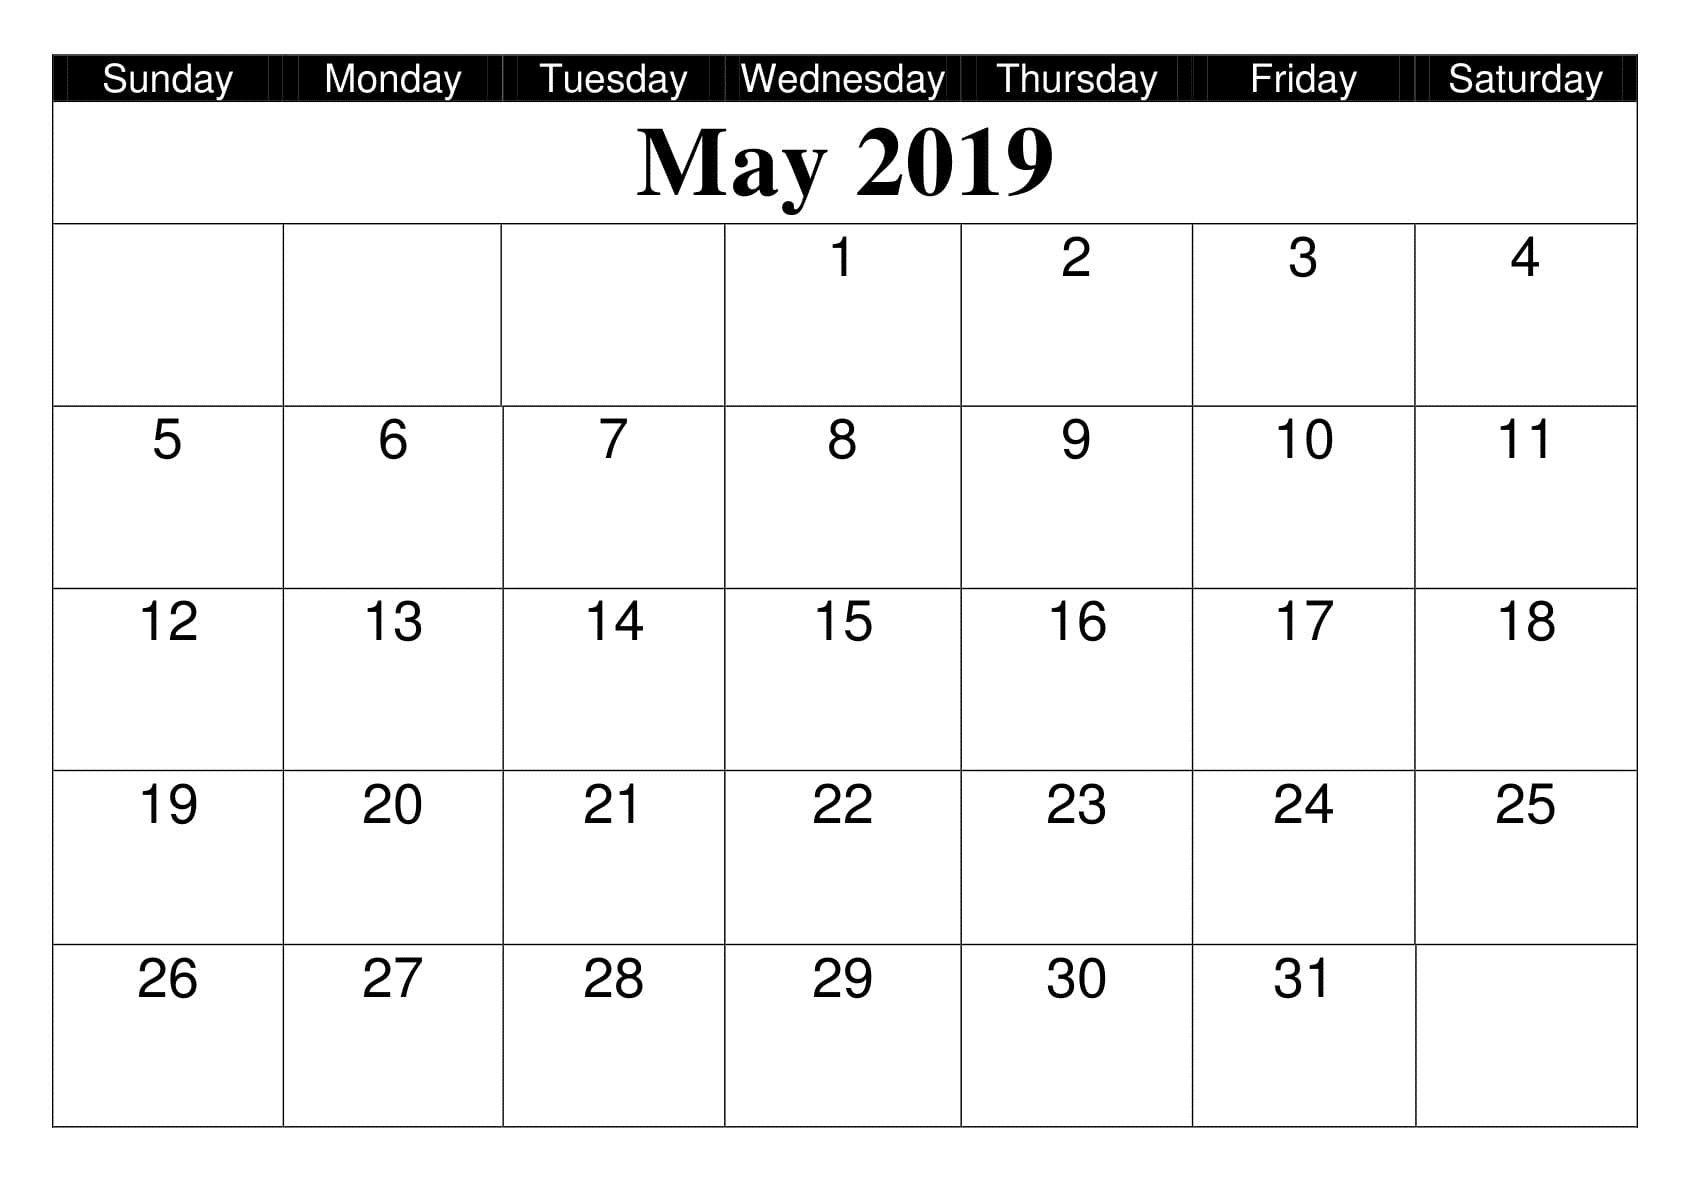 May 2019 Calendar Blank Printable | 200+ May 2019 Calendar Template_Google Calendar Gone Blank